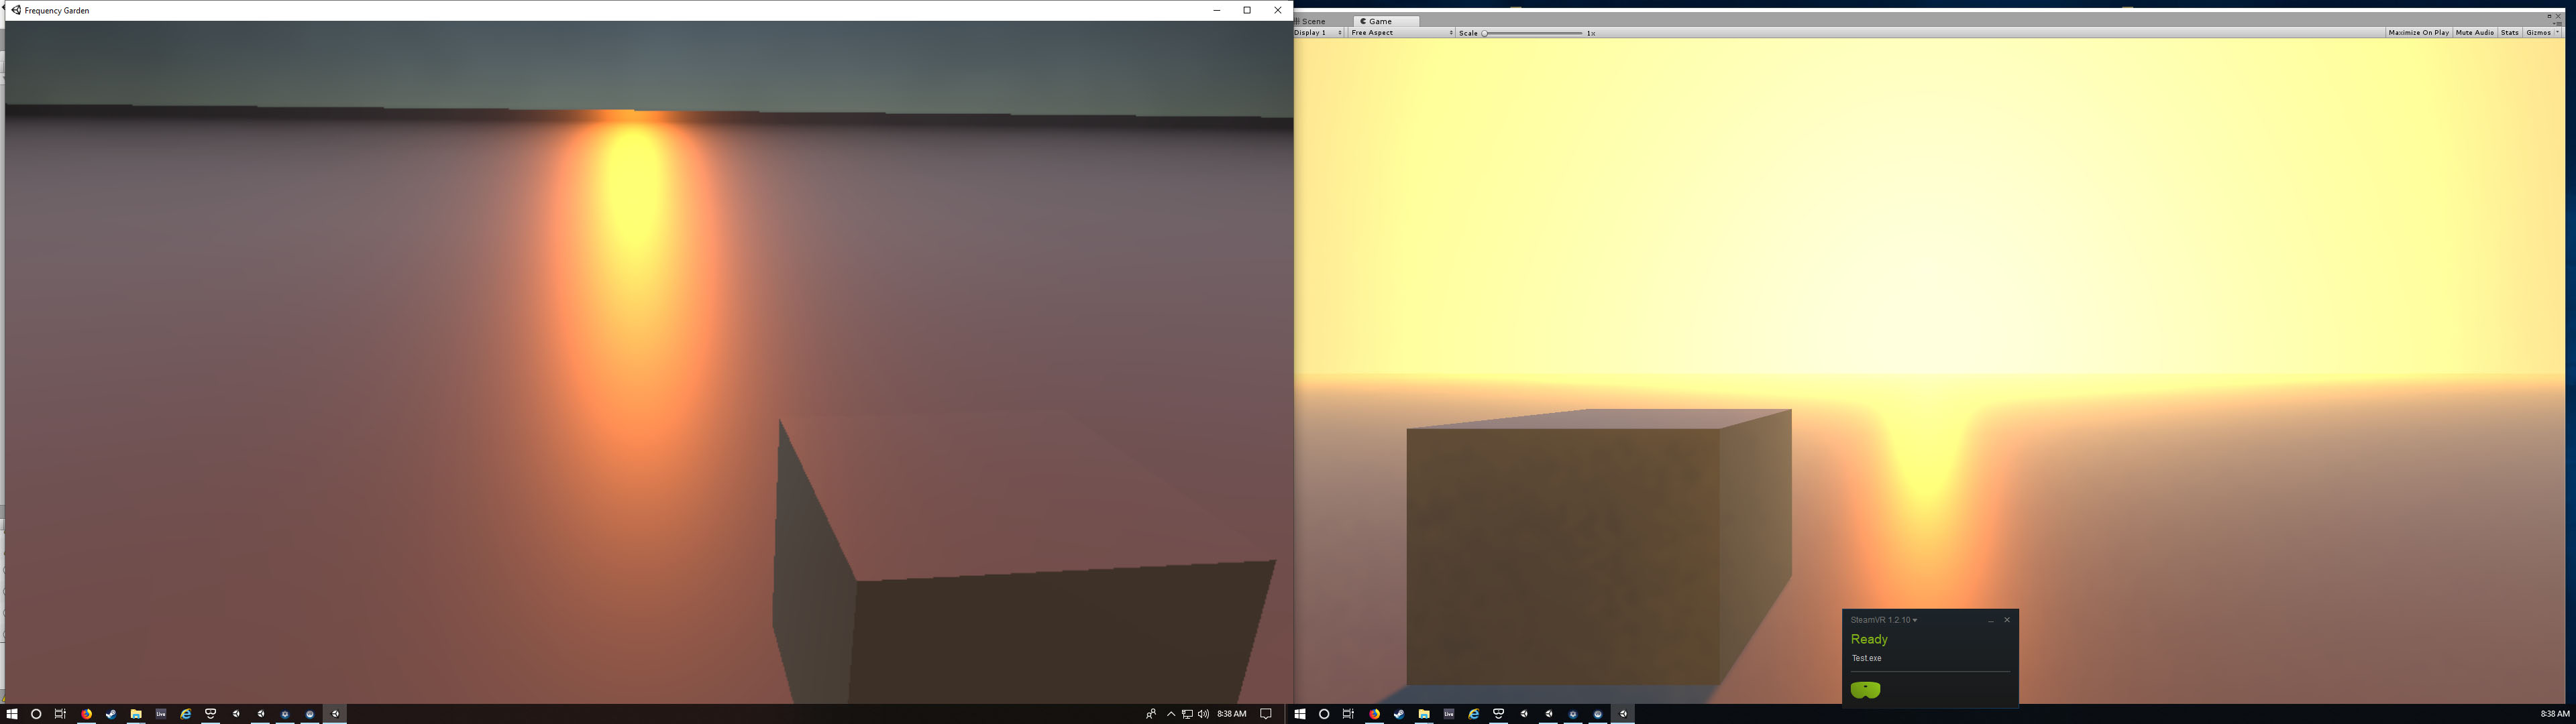 Aura VR Help.jpg